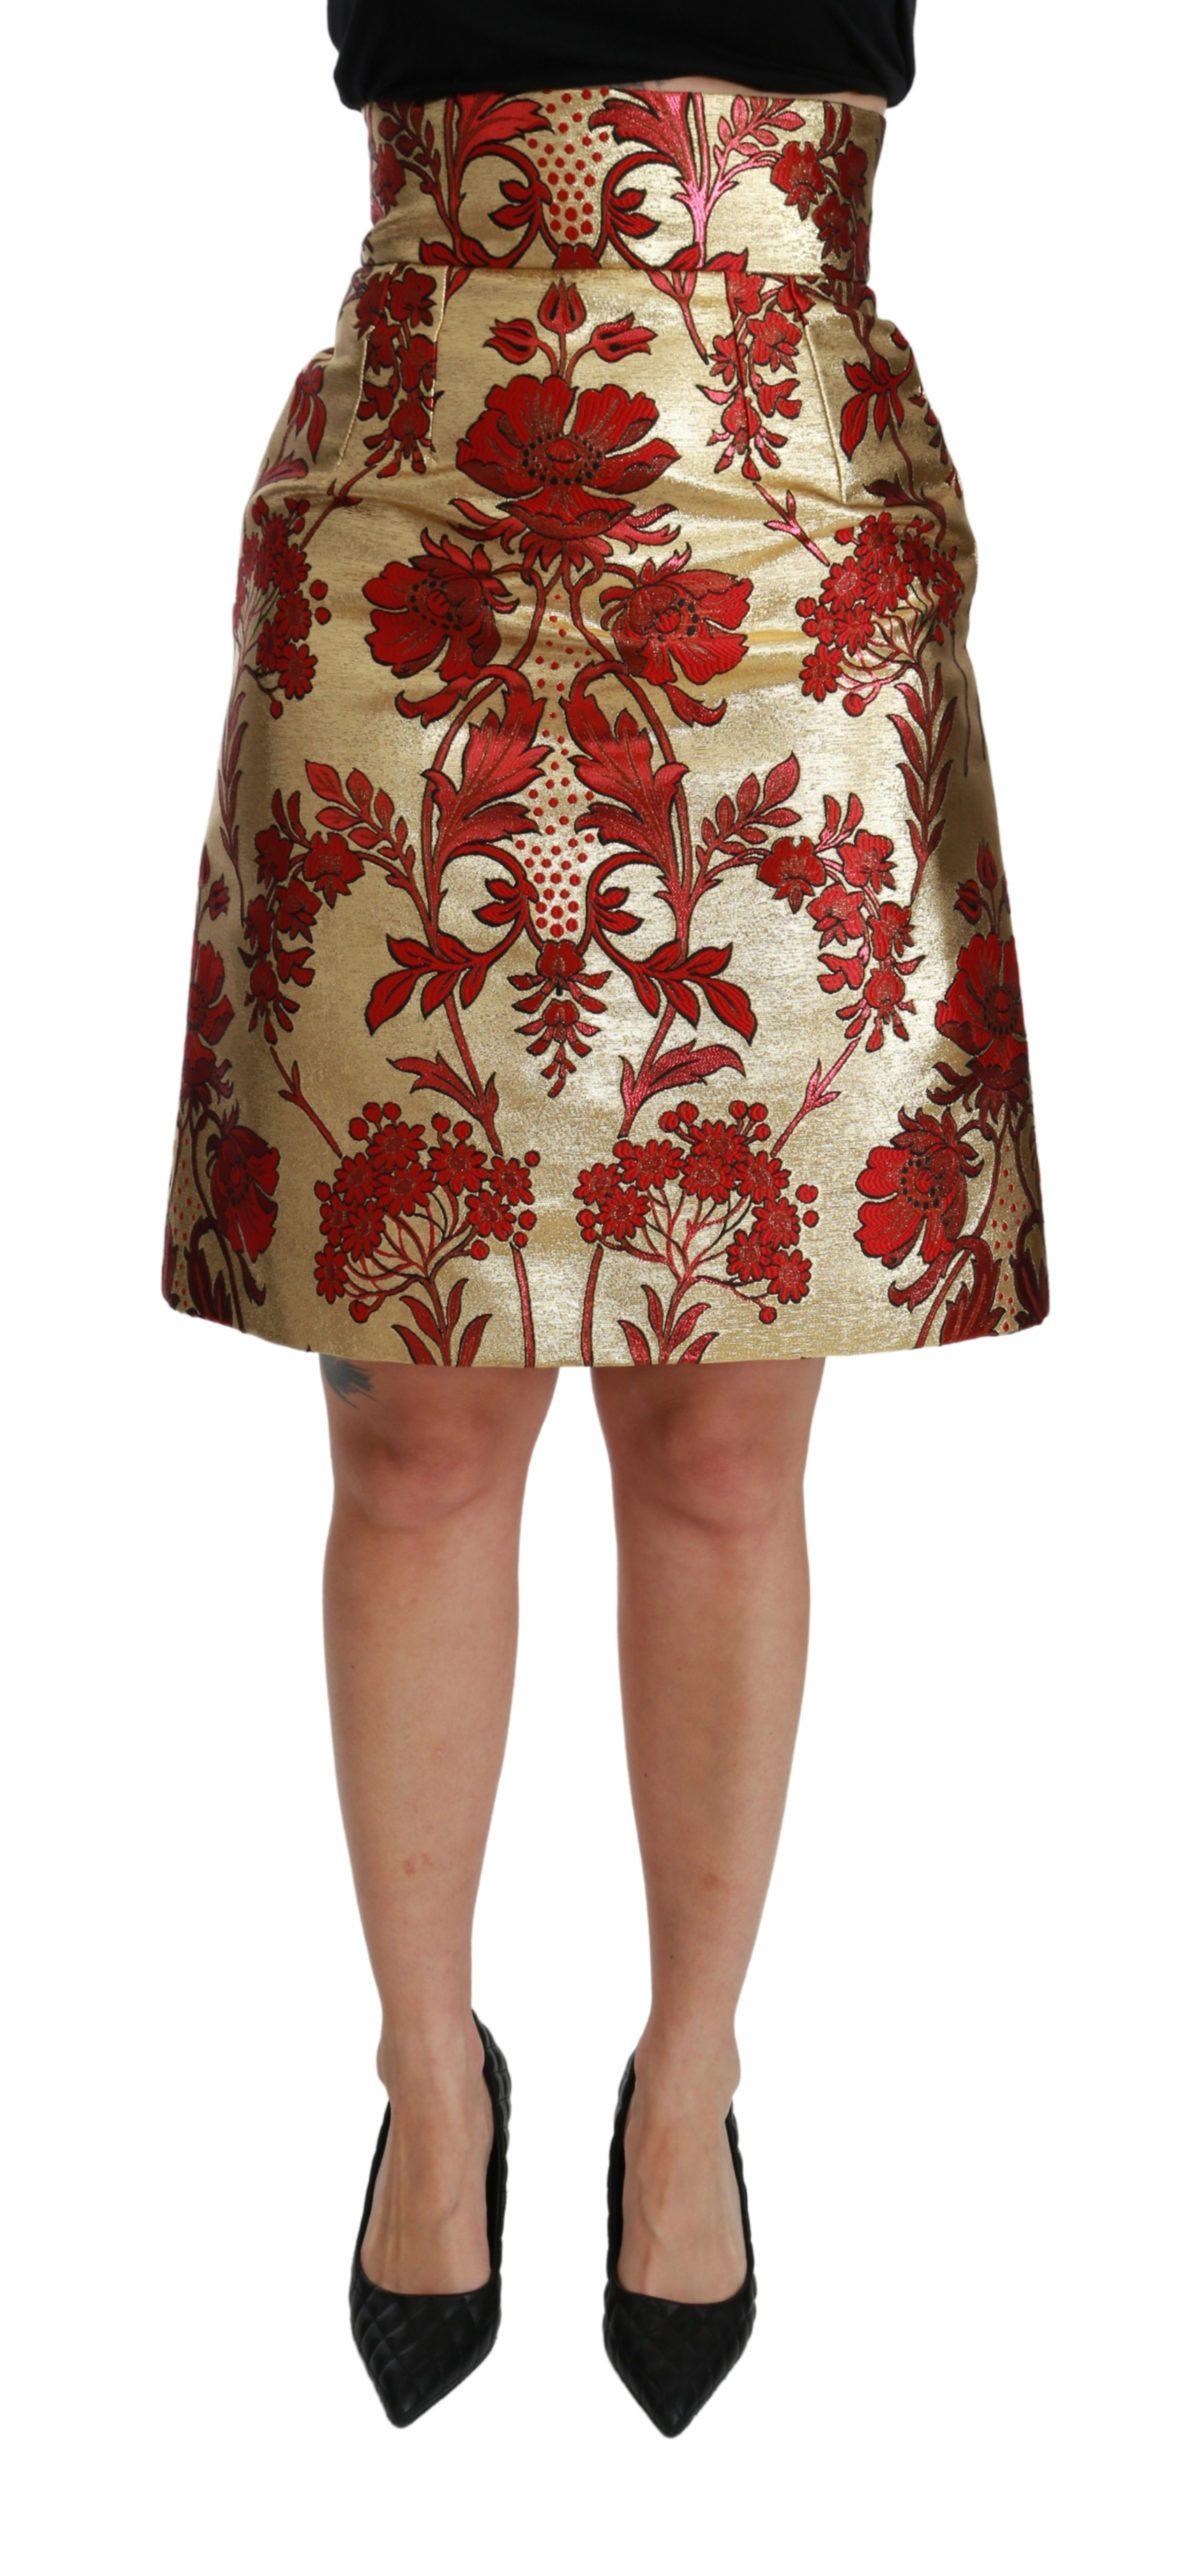 Dolce & Gabbana Women's Floral Jacquard High Waist Mini Skirt Gold SKI1417 - IT36   XS